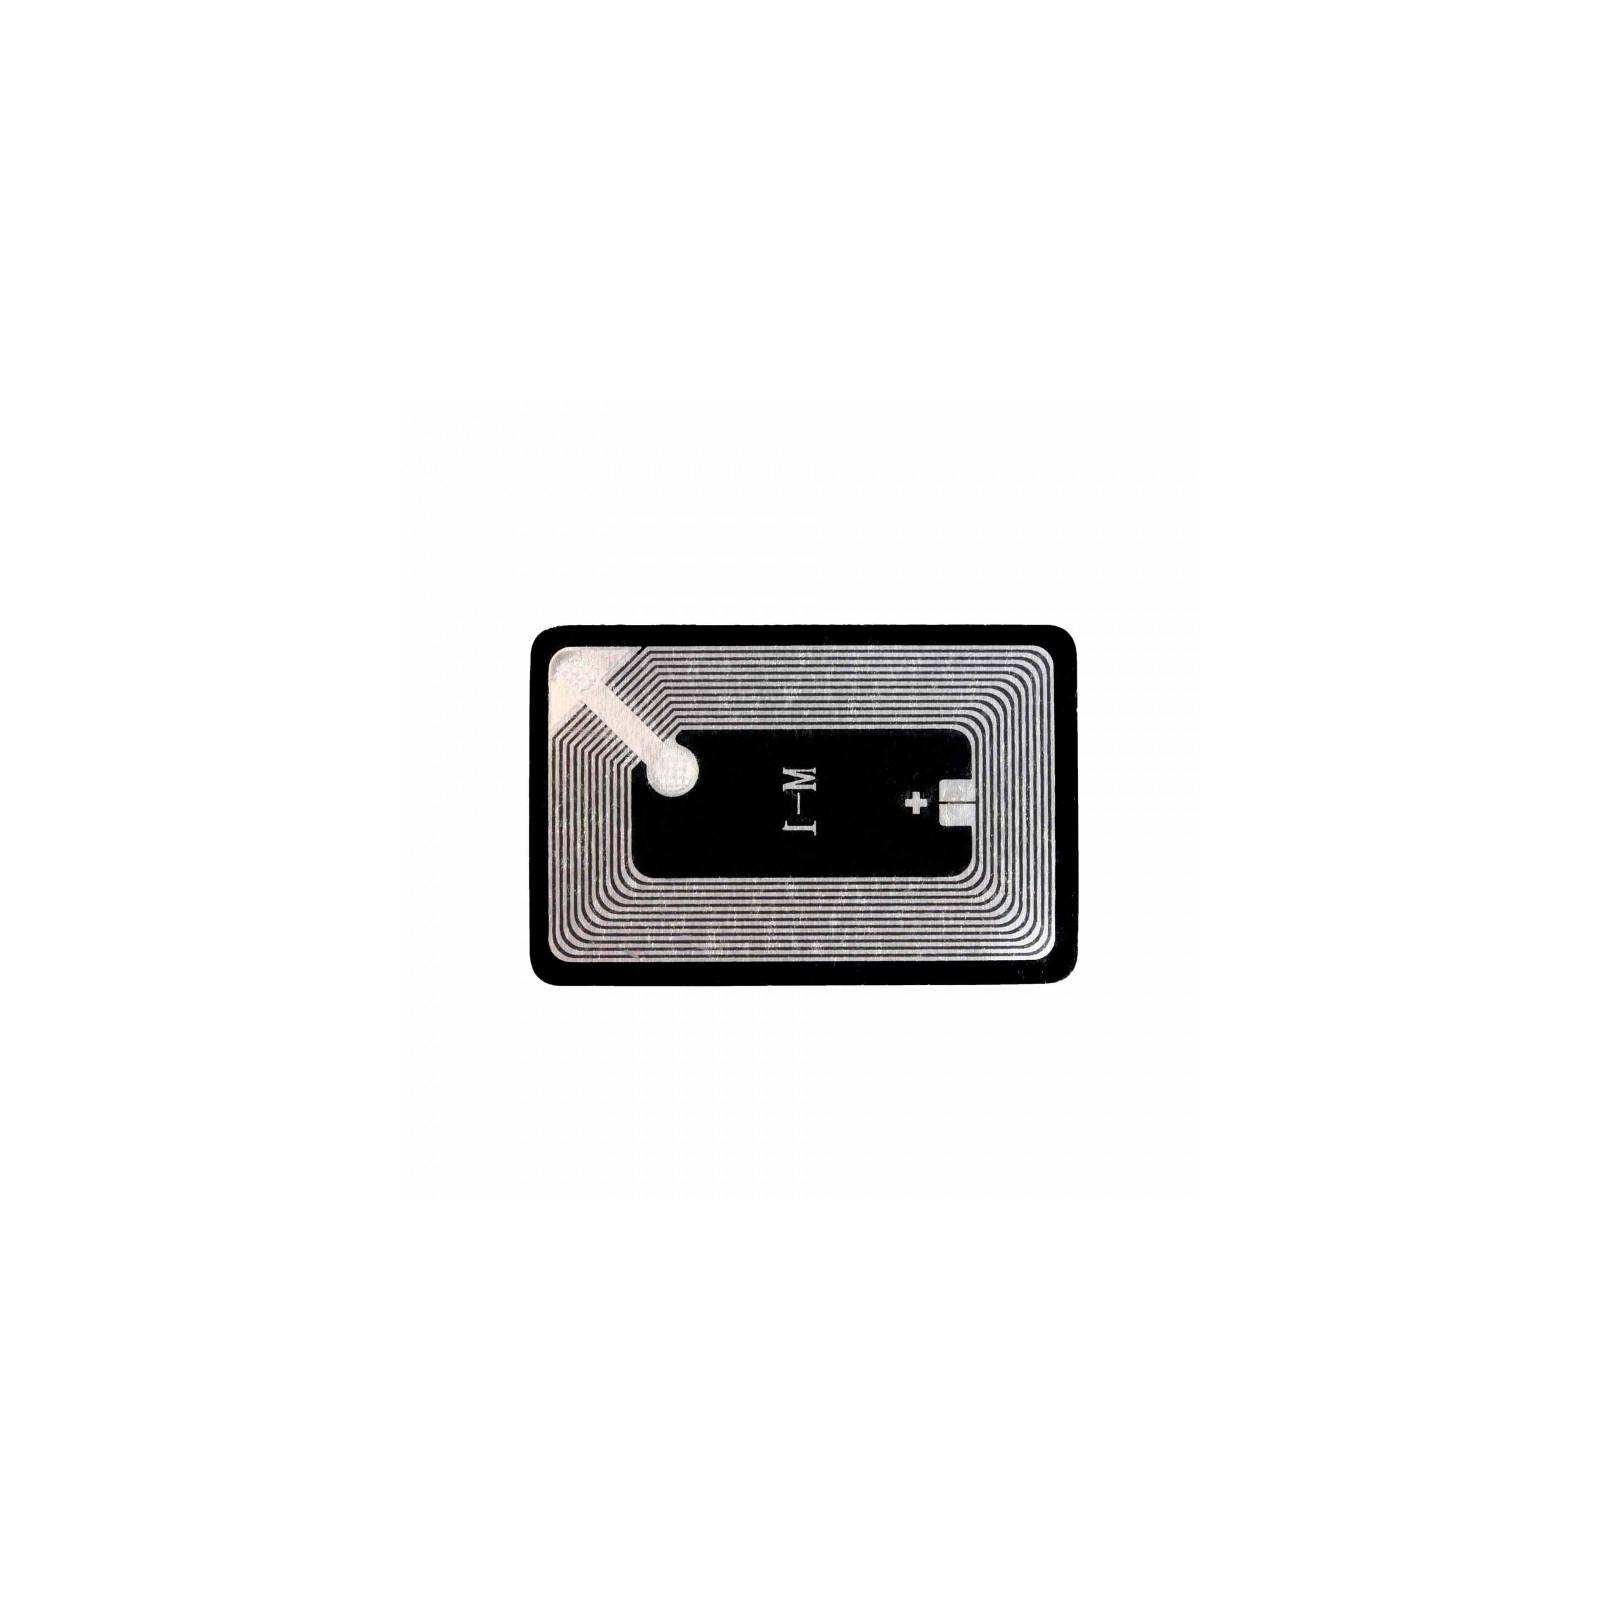 Чип для картриджа KyoceraFS-4020 (TK-360) (EU/MEA) 34.4k (MPS) Static Control (MPSTK360CP-EU)